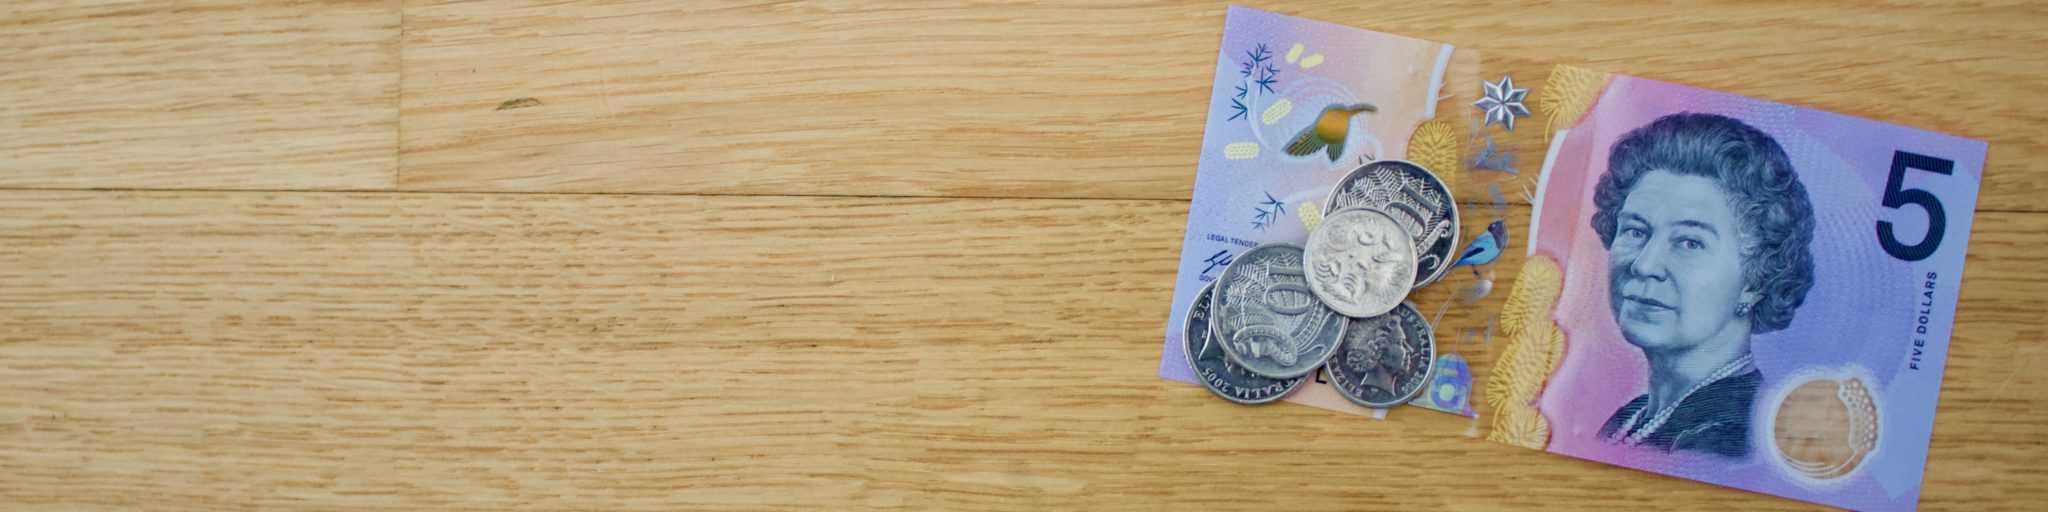 Wie zahlt man in Australien